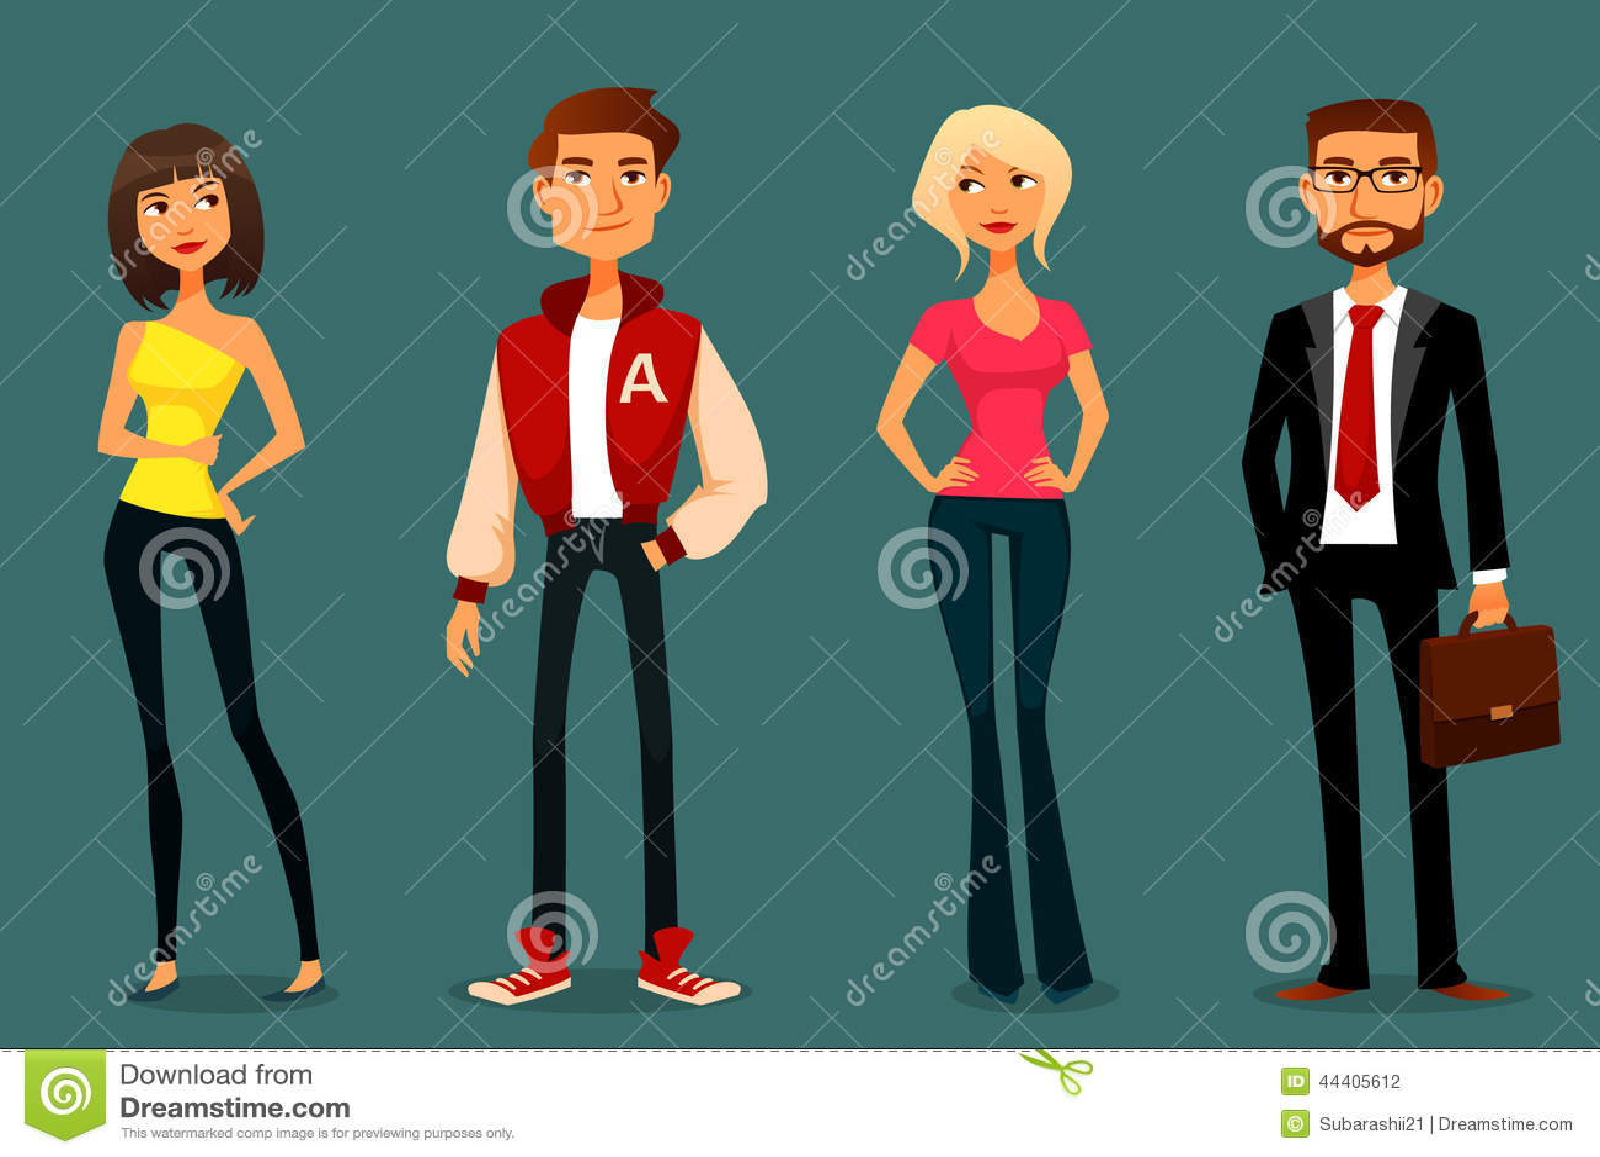 cute cartoon illustration of people stock vector image